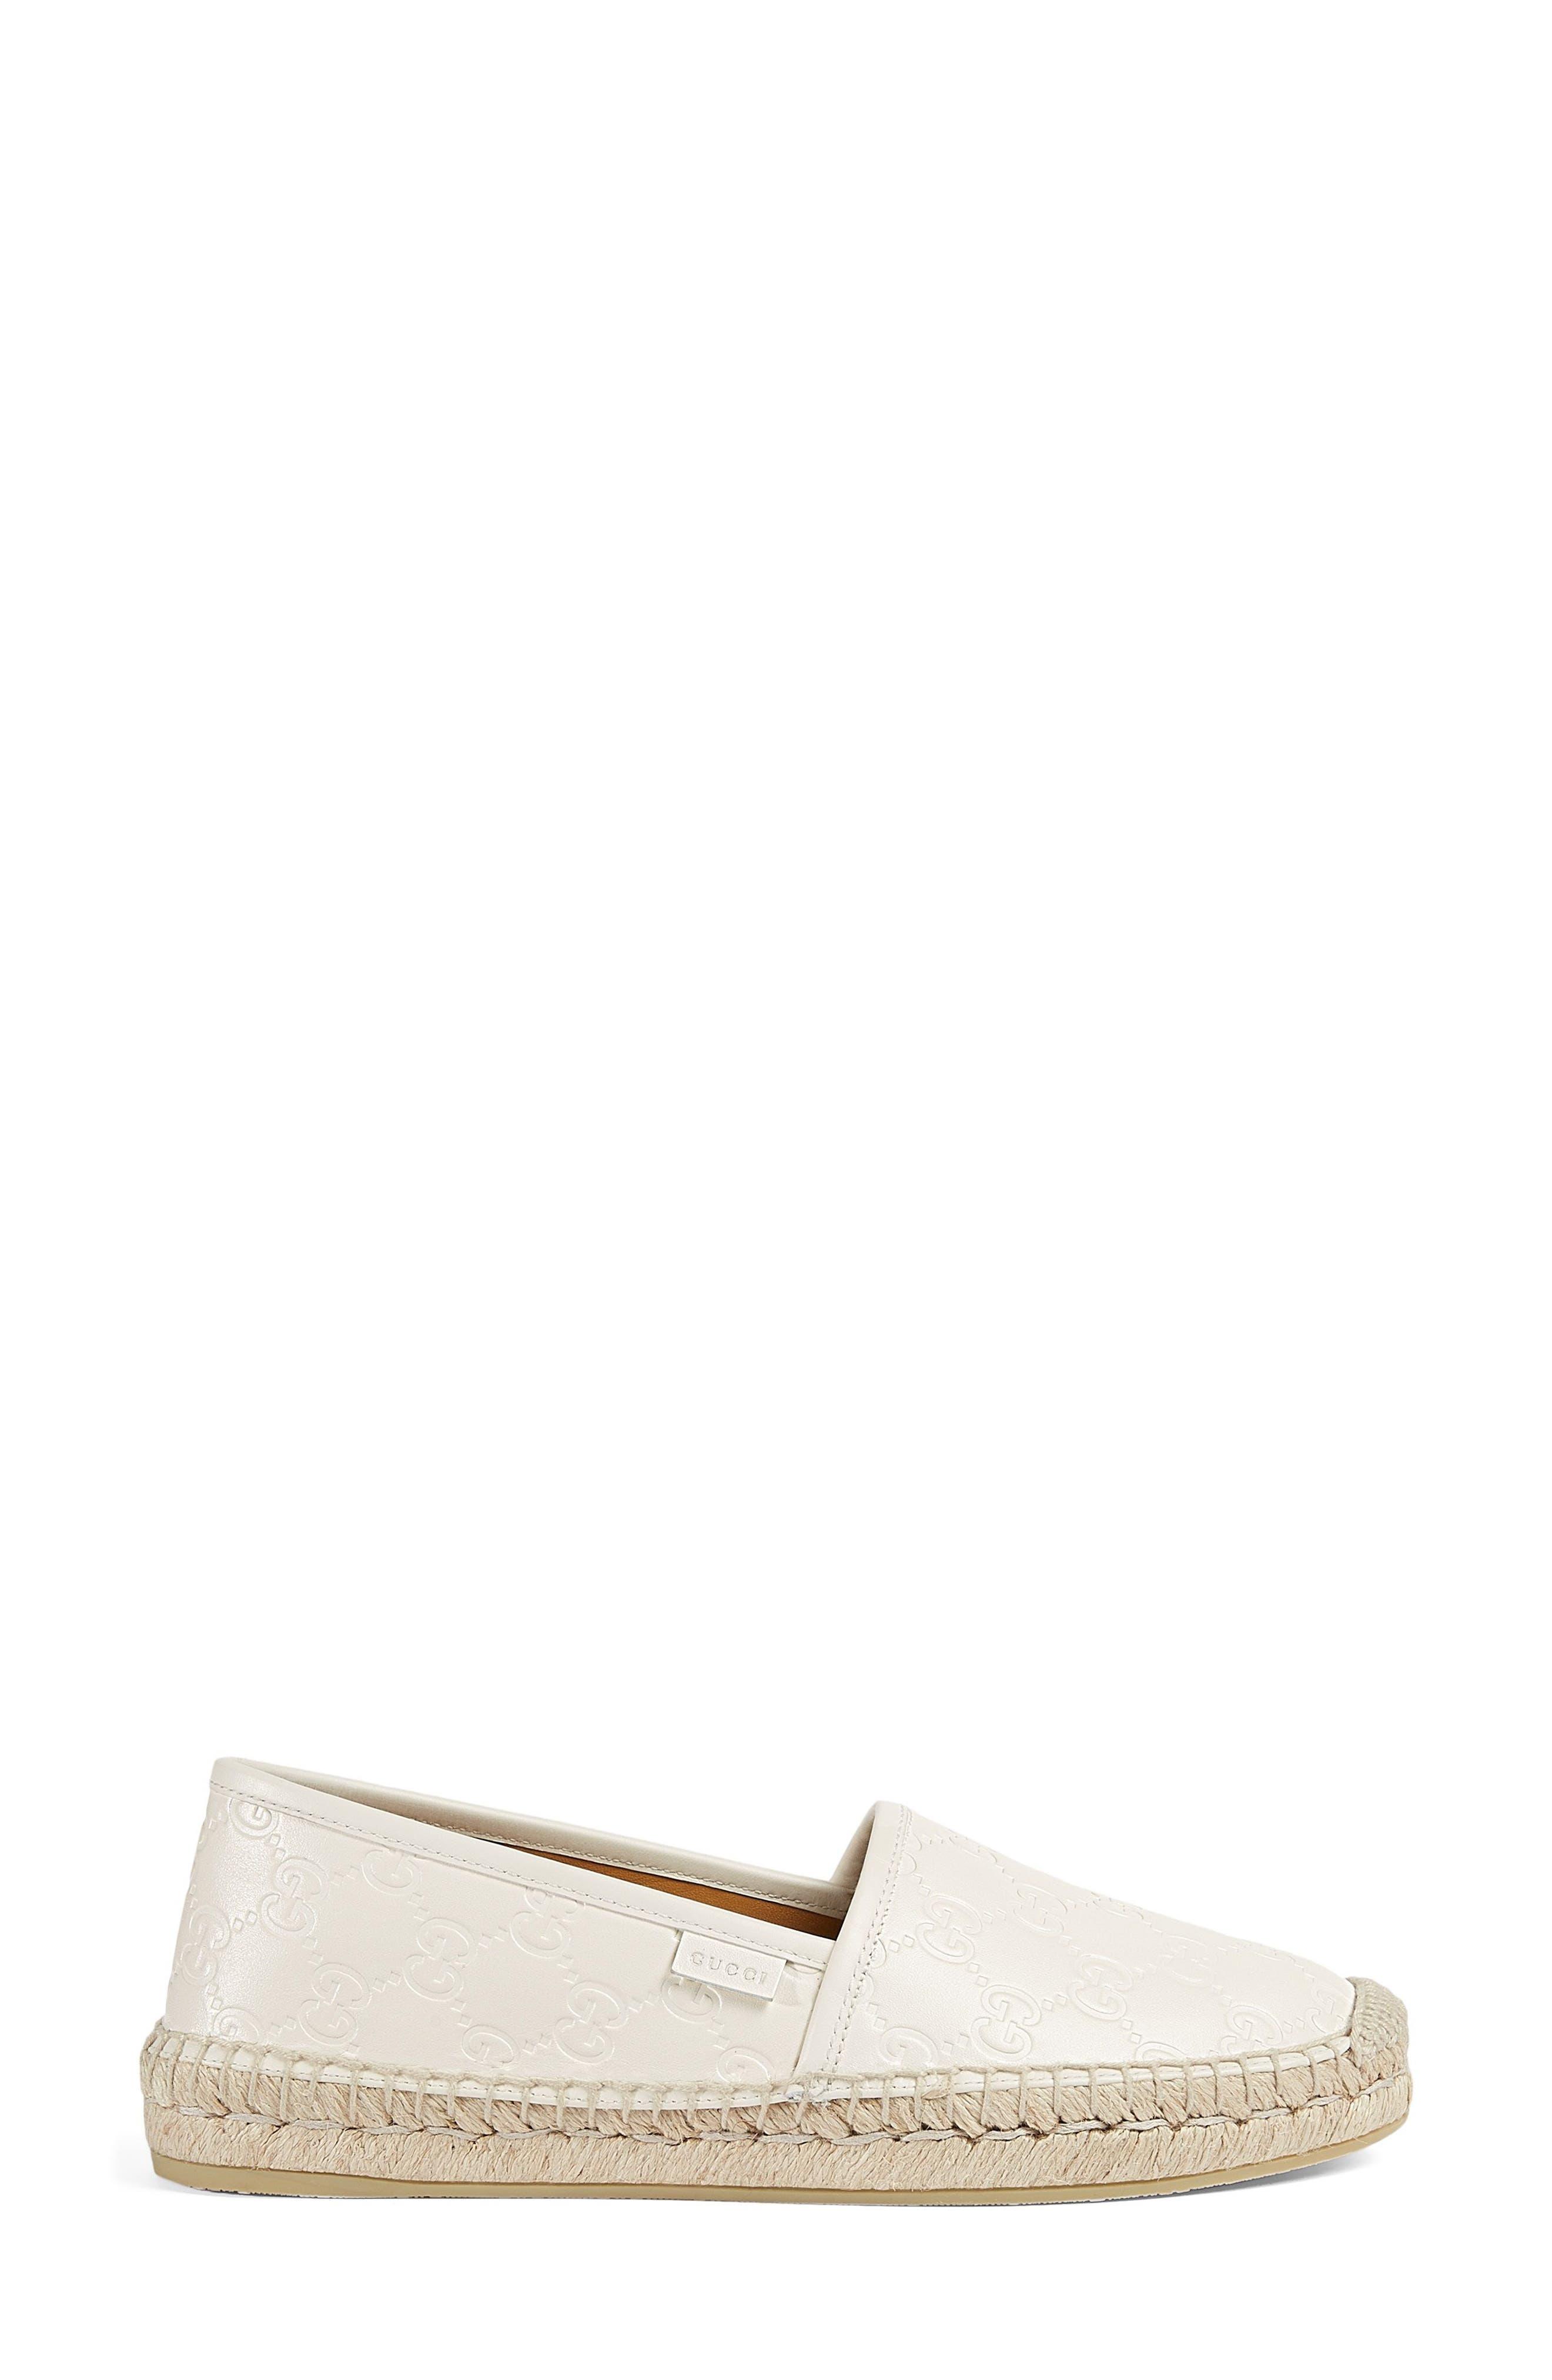 Alternate Image 1 Selected - Gucci Pilar Espadrille Flat (Women)